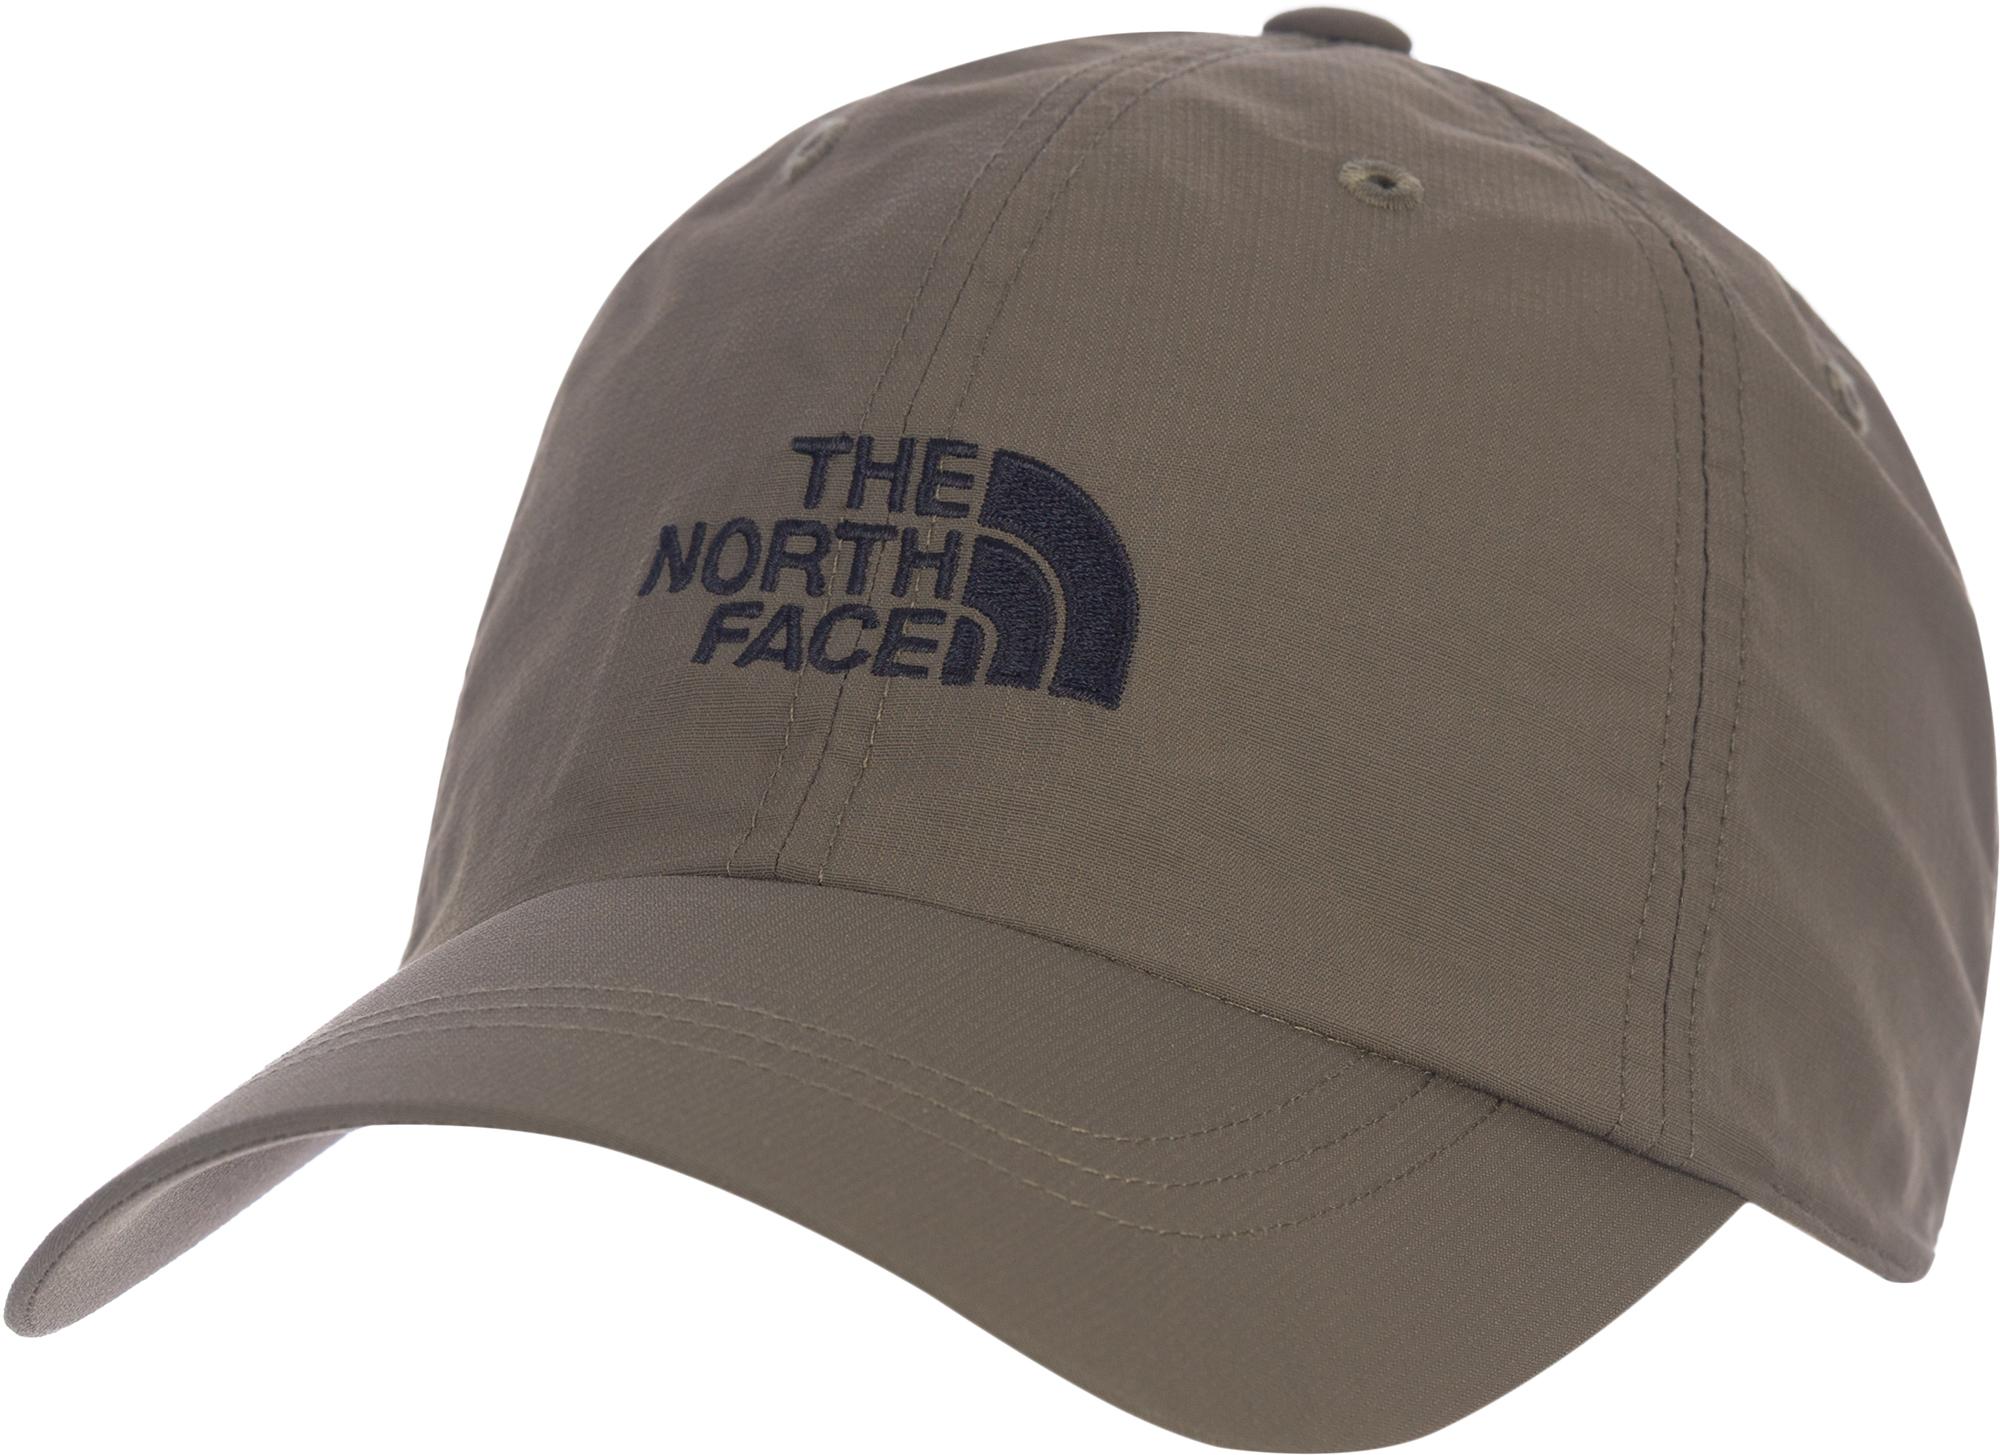 The North Face Бейсболка The North Face Horizon, размер 59-61 цена